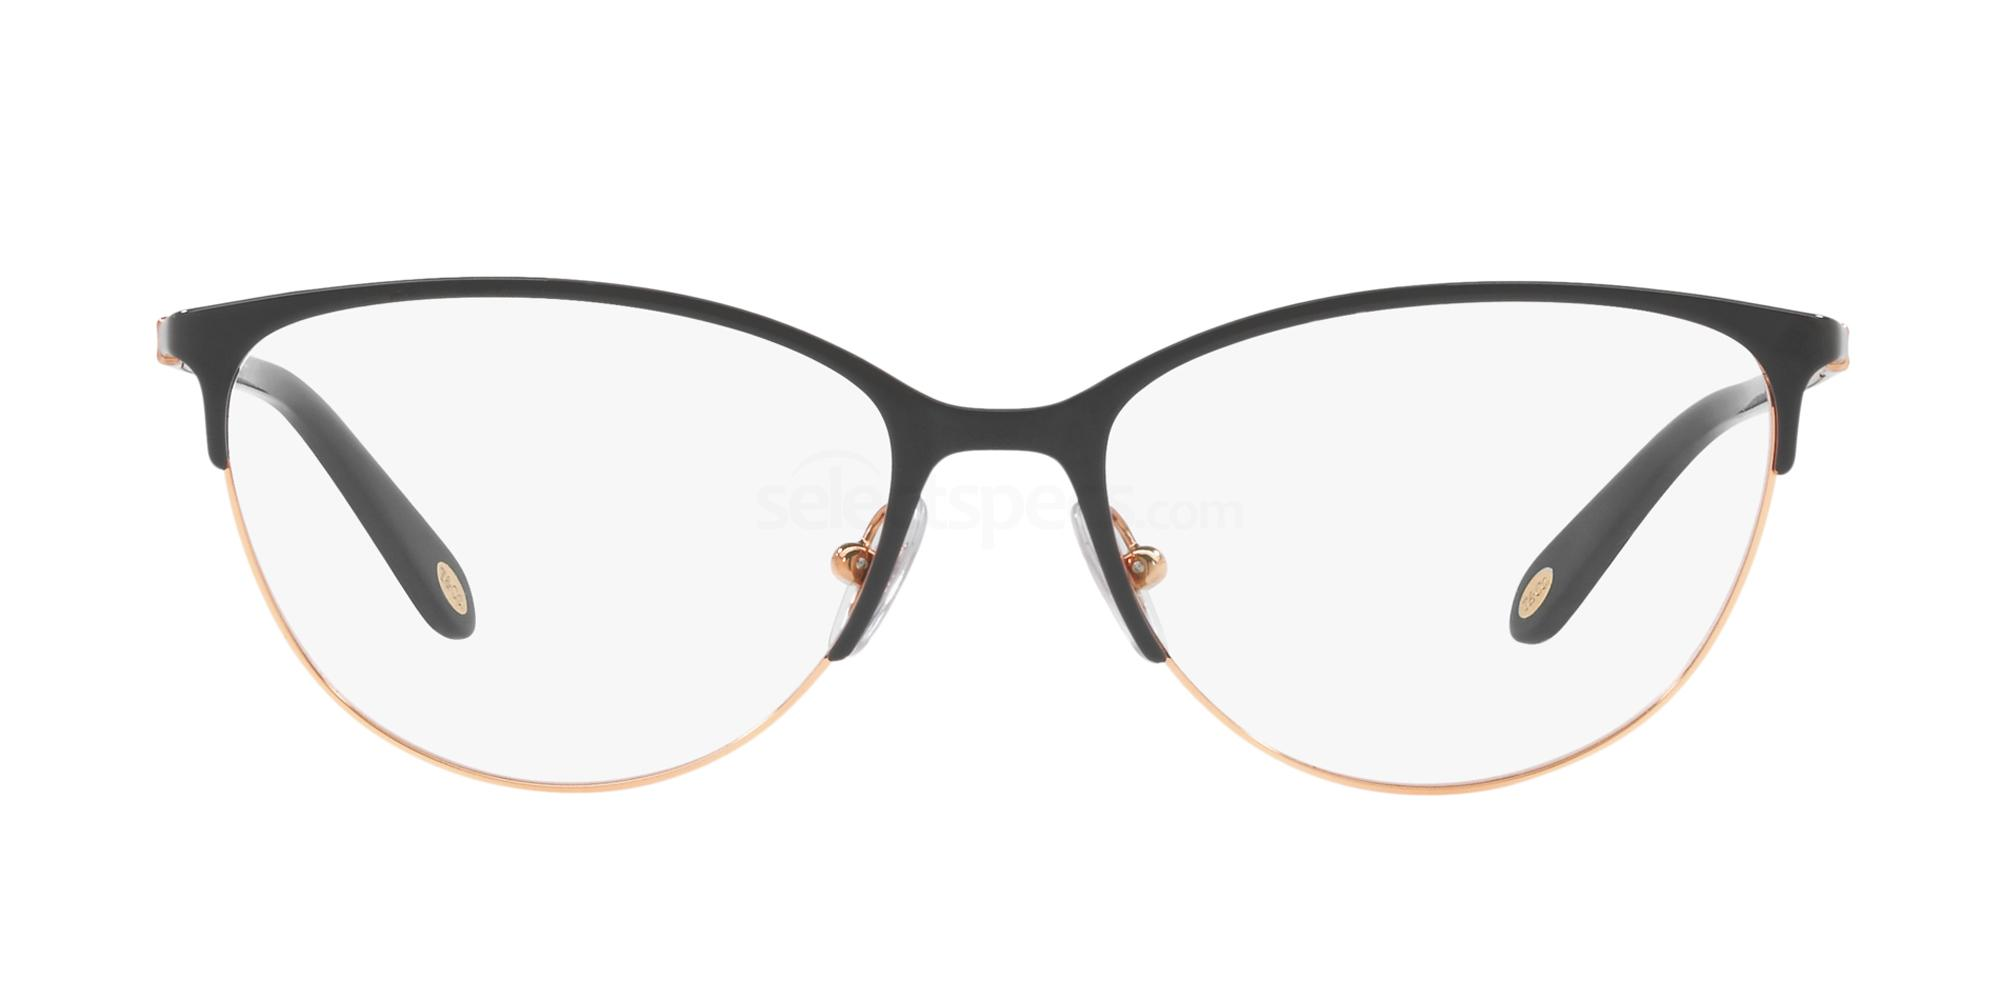 6122 TF1127 Glasses, Tiffany & Co.